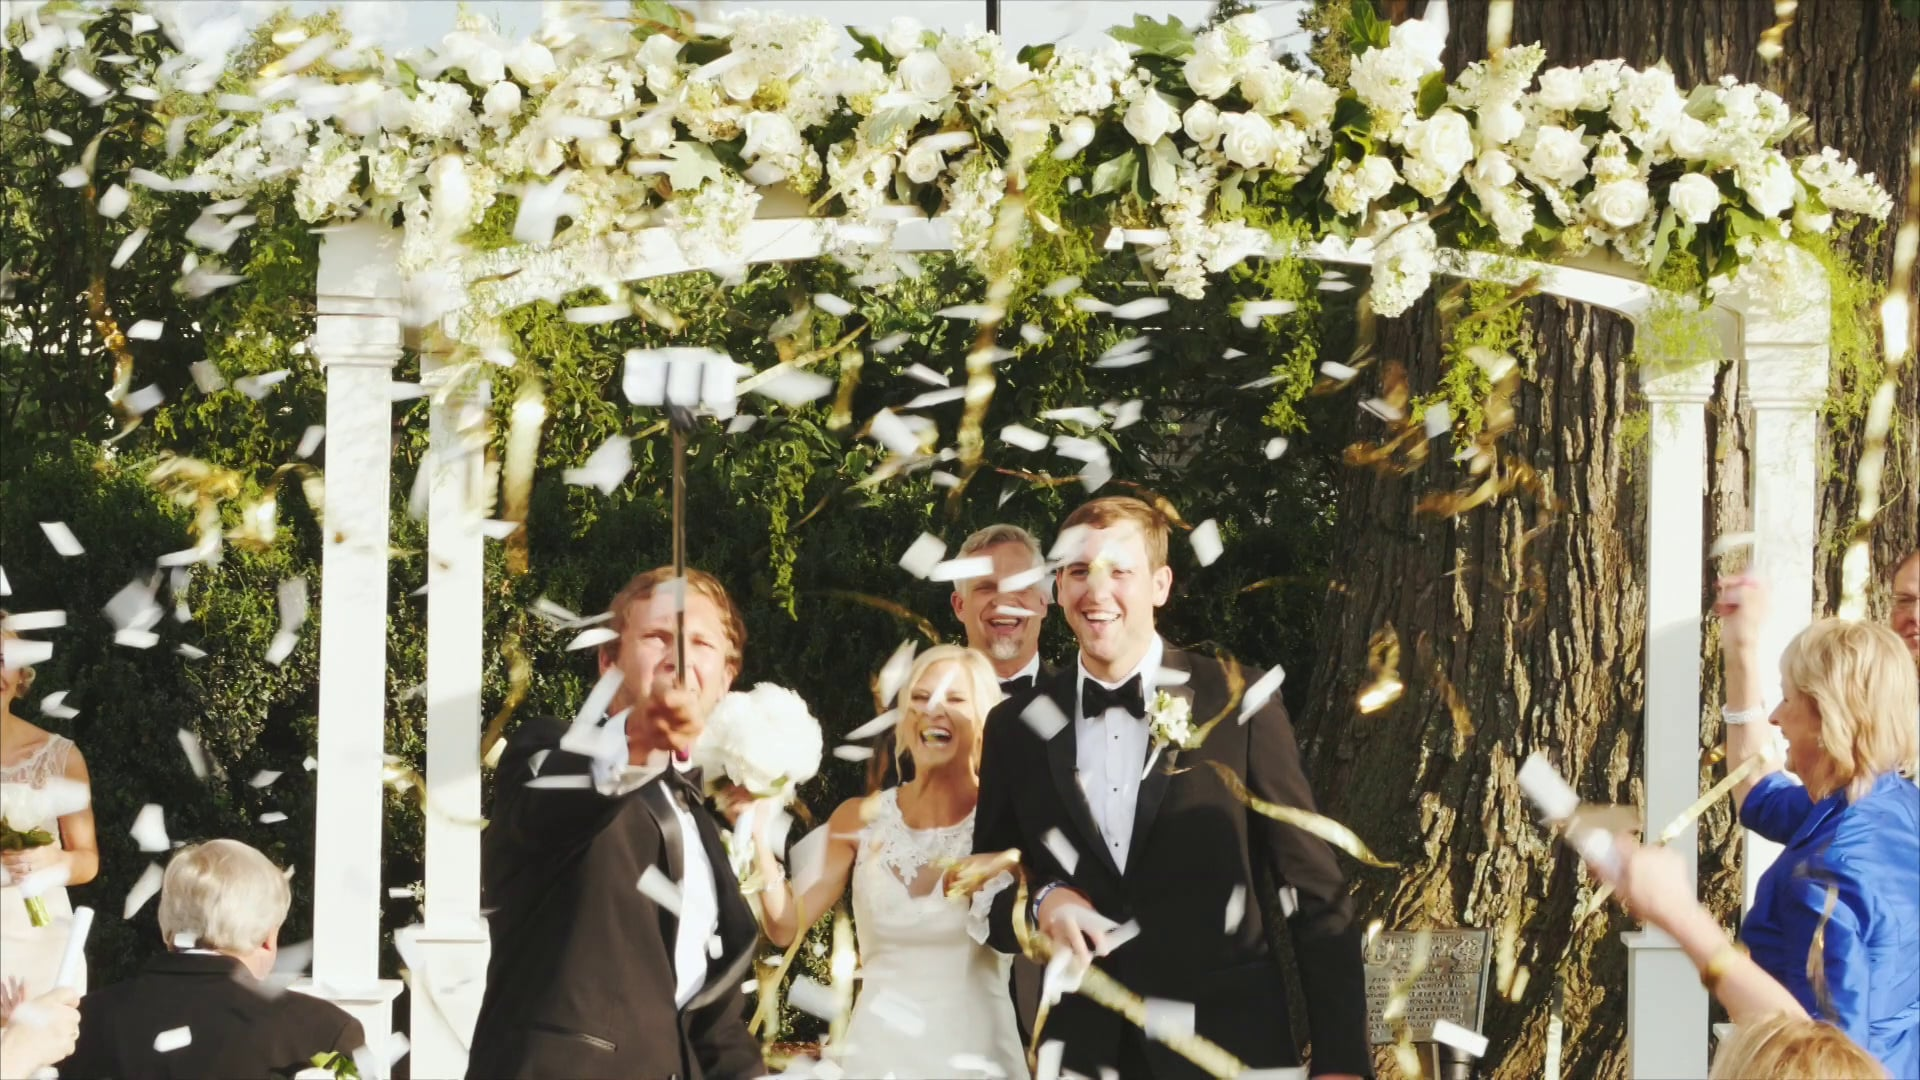 Shea + Reese   Belle Meade Country Club Nashville, TN Wedding